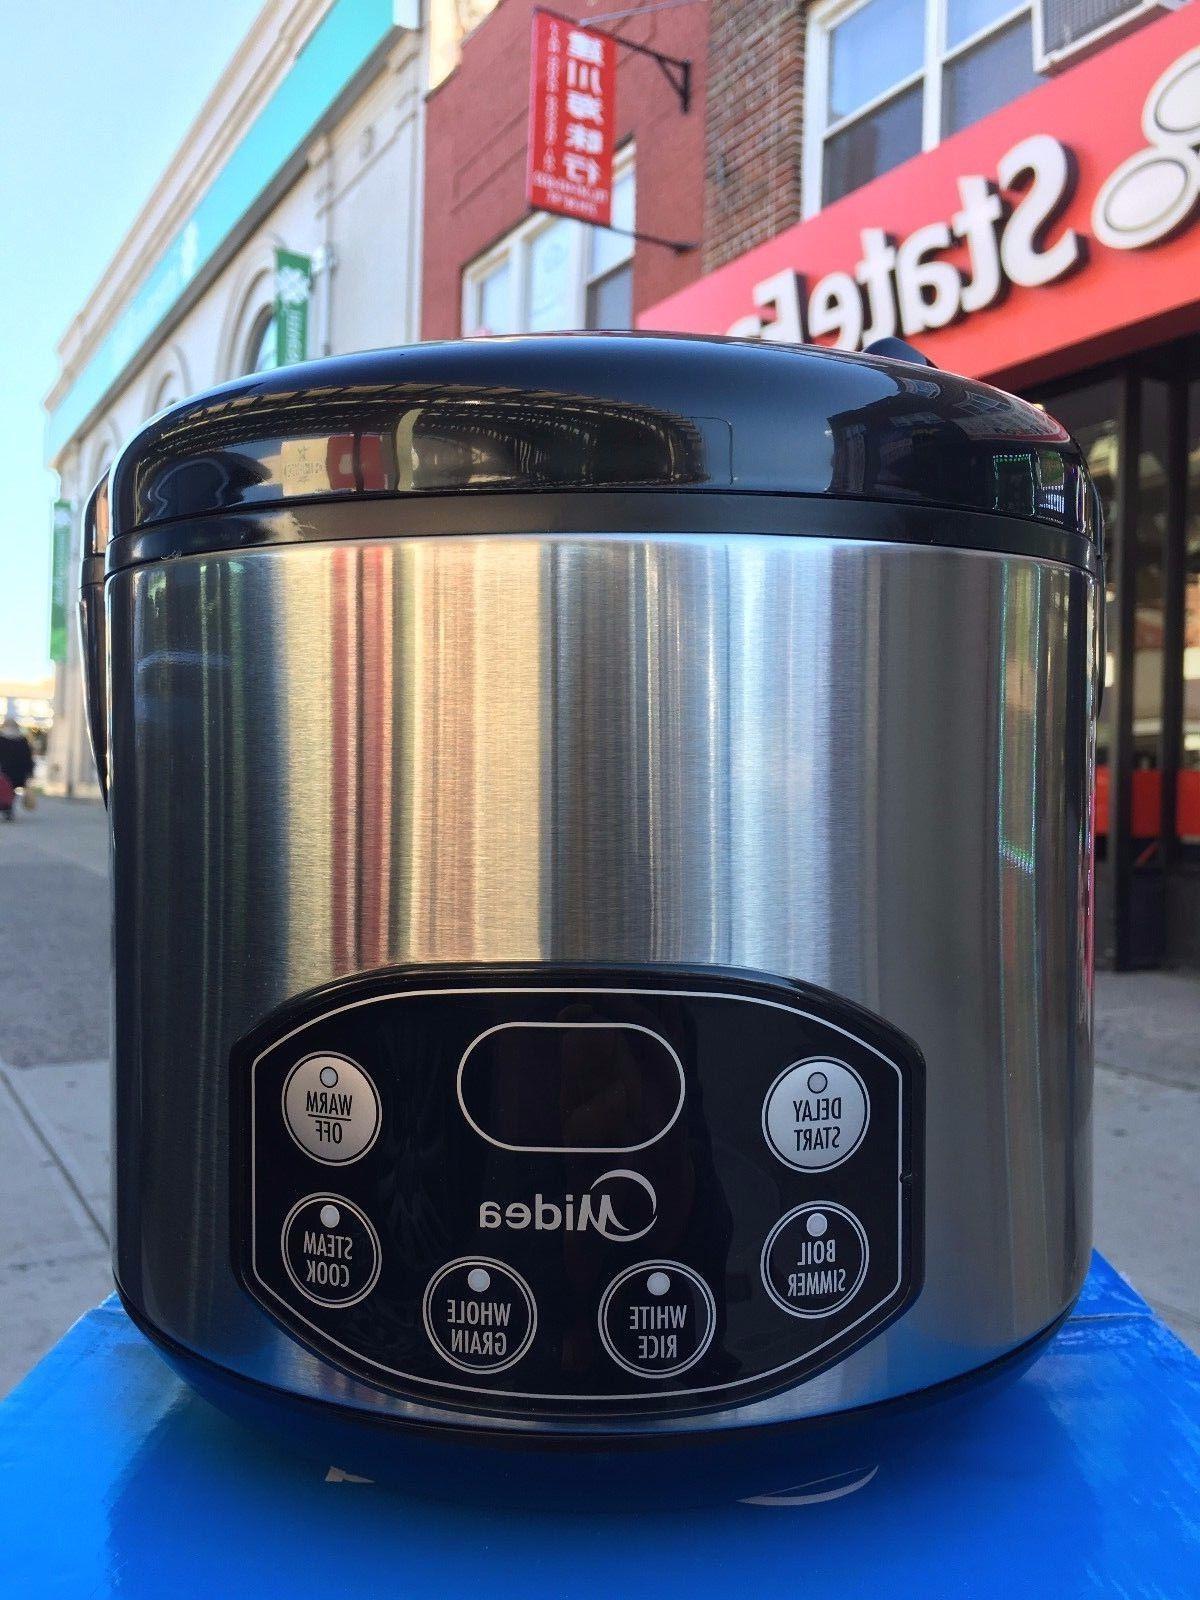 Midea Digital Stainless steel cooker 10 Cups